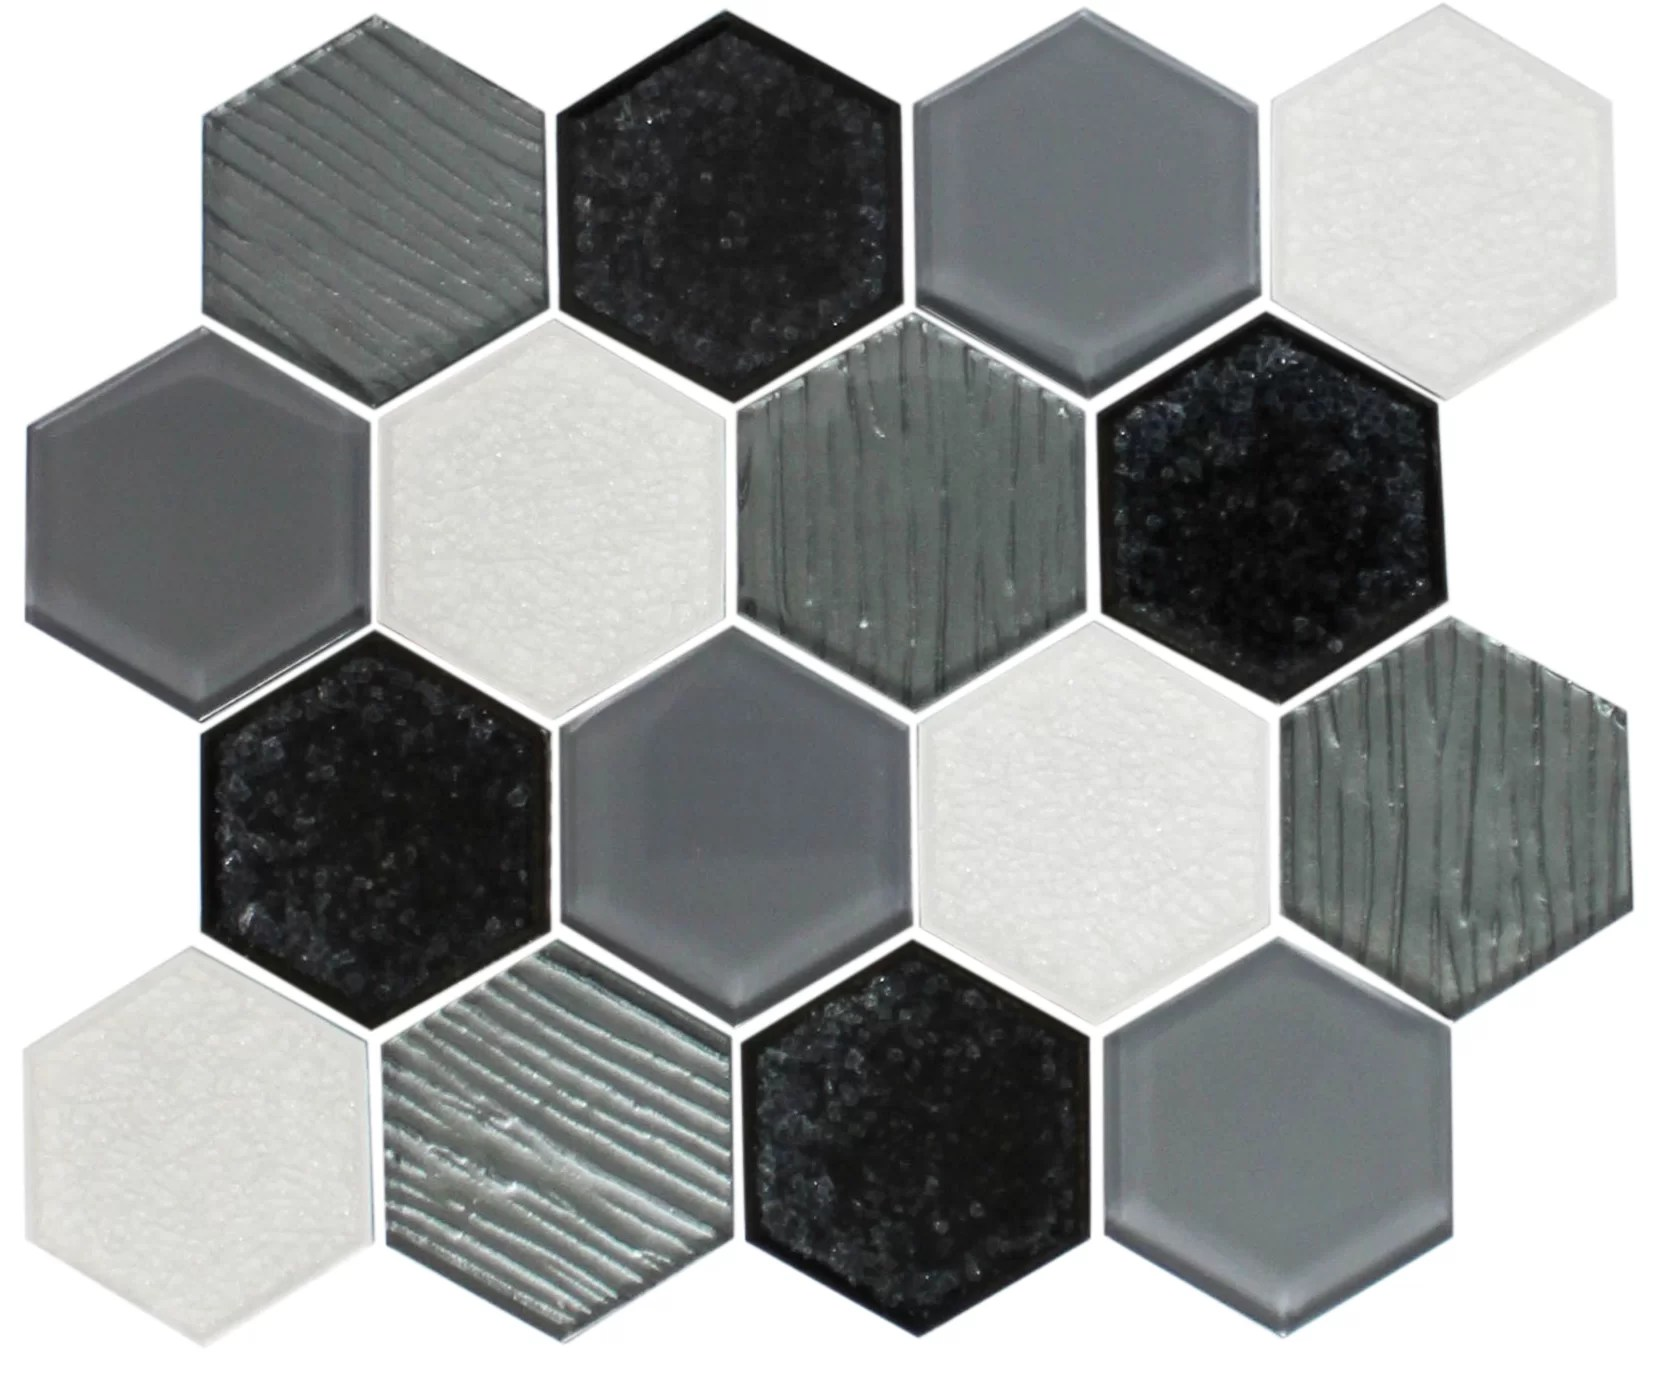 kimberlei crackle hexagon mix random sized glass mosaic tile in white black